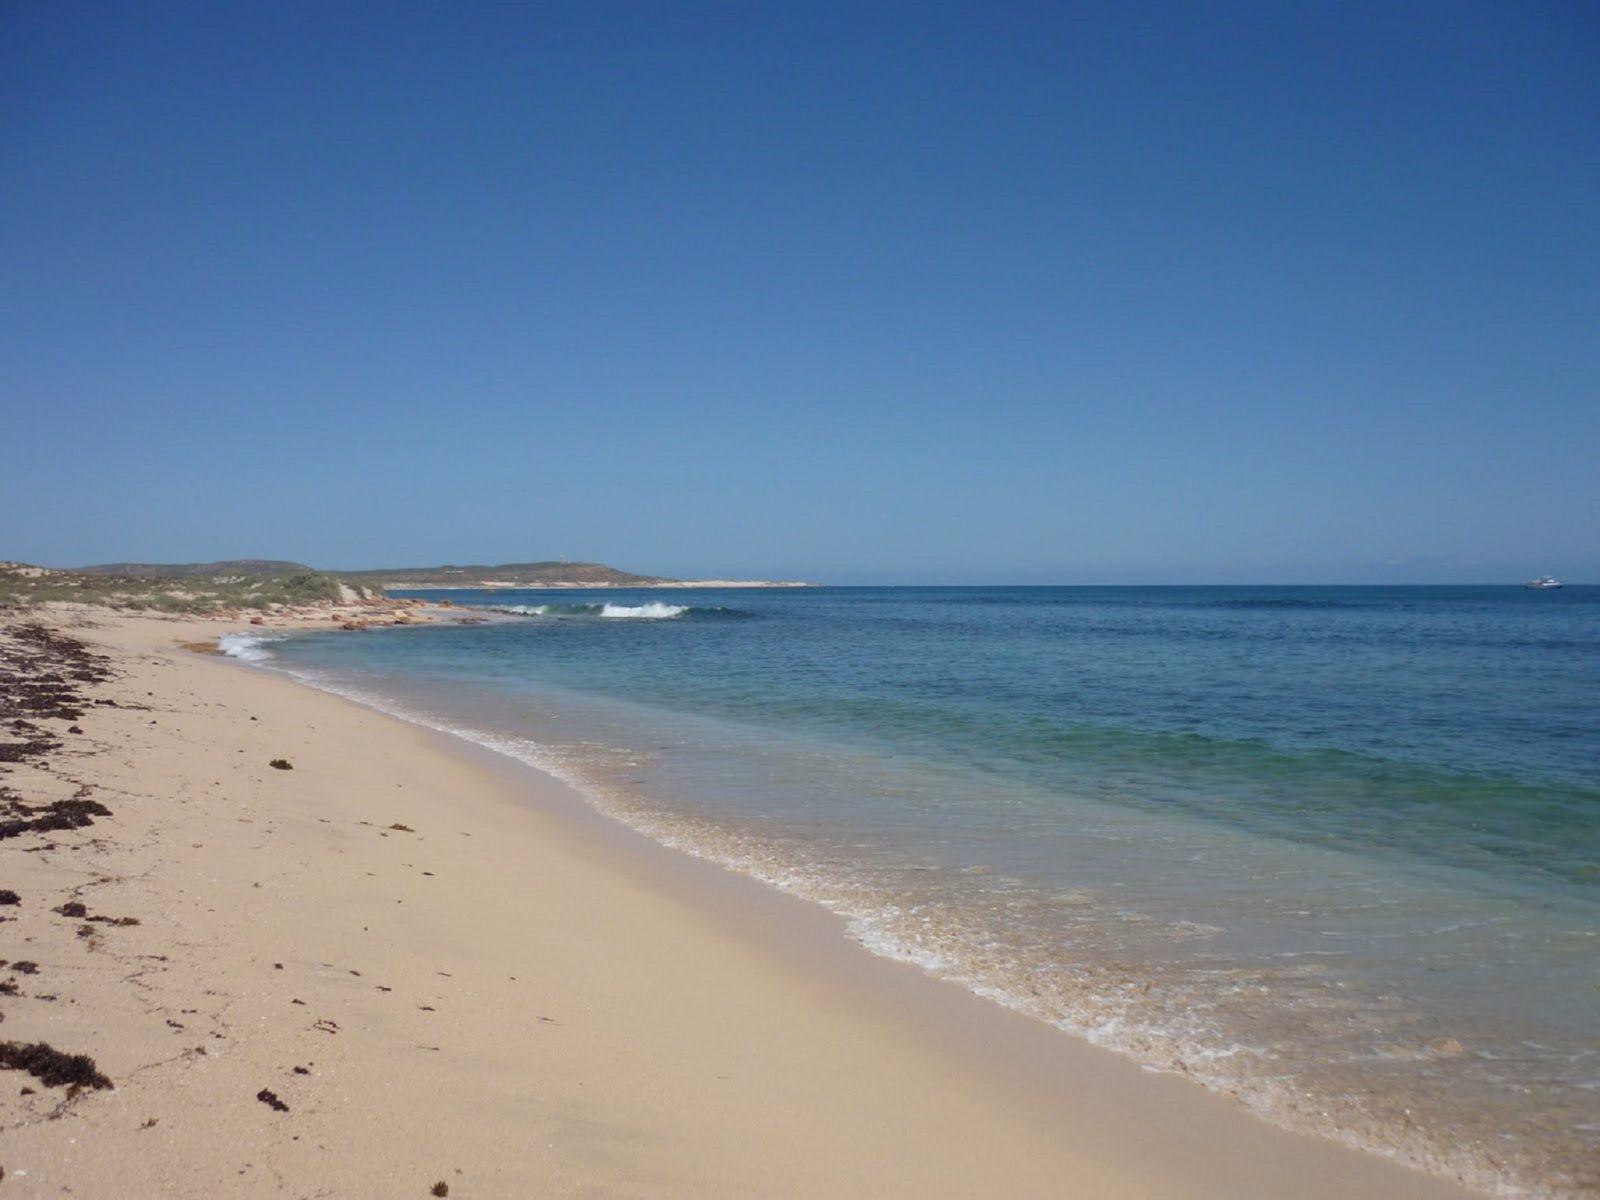 Lighthouse Bay, Exmouth, Western Australia